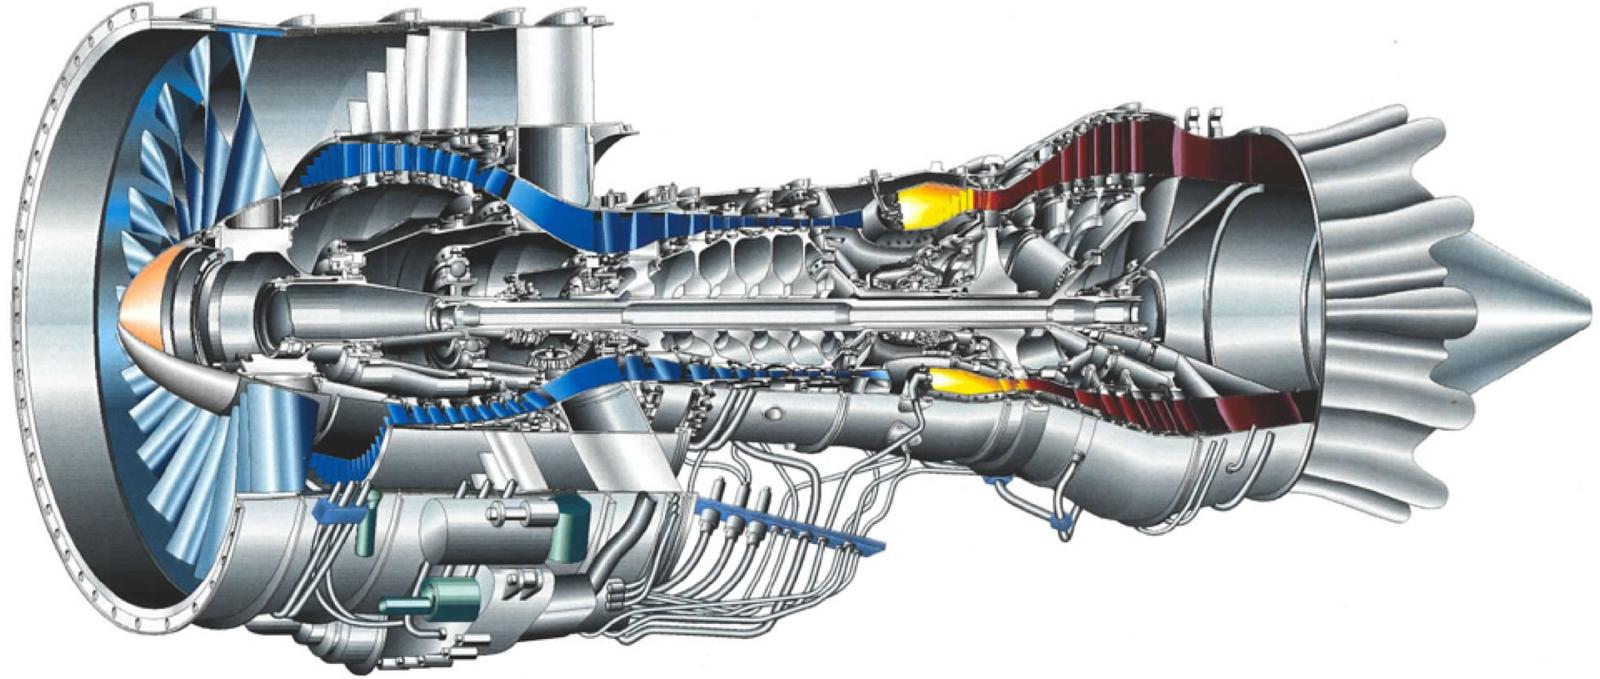 gas turbine engine 2011-1-11 mashproekt, ukraine fizika scientific, new zealand gt16000 gas-turbine engine for power generation brief technical description.